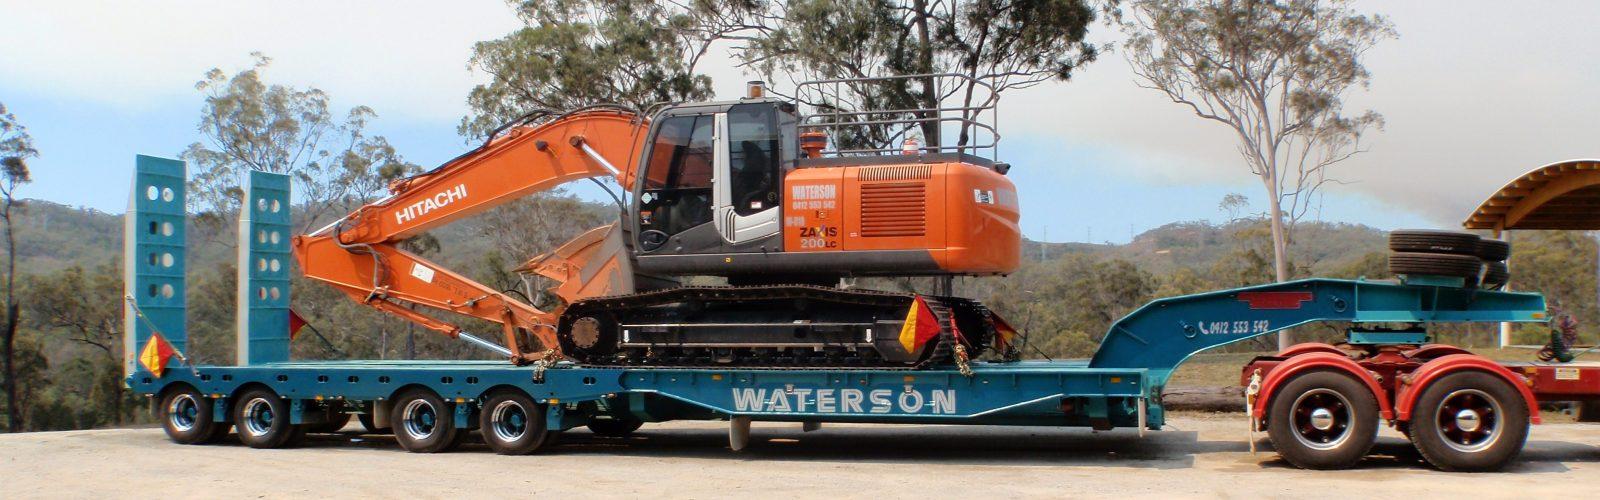 Plant & Equipment Mechanics Gladstone   Earthmoving Machinery